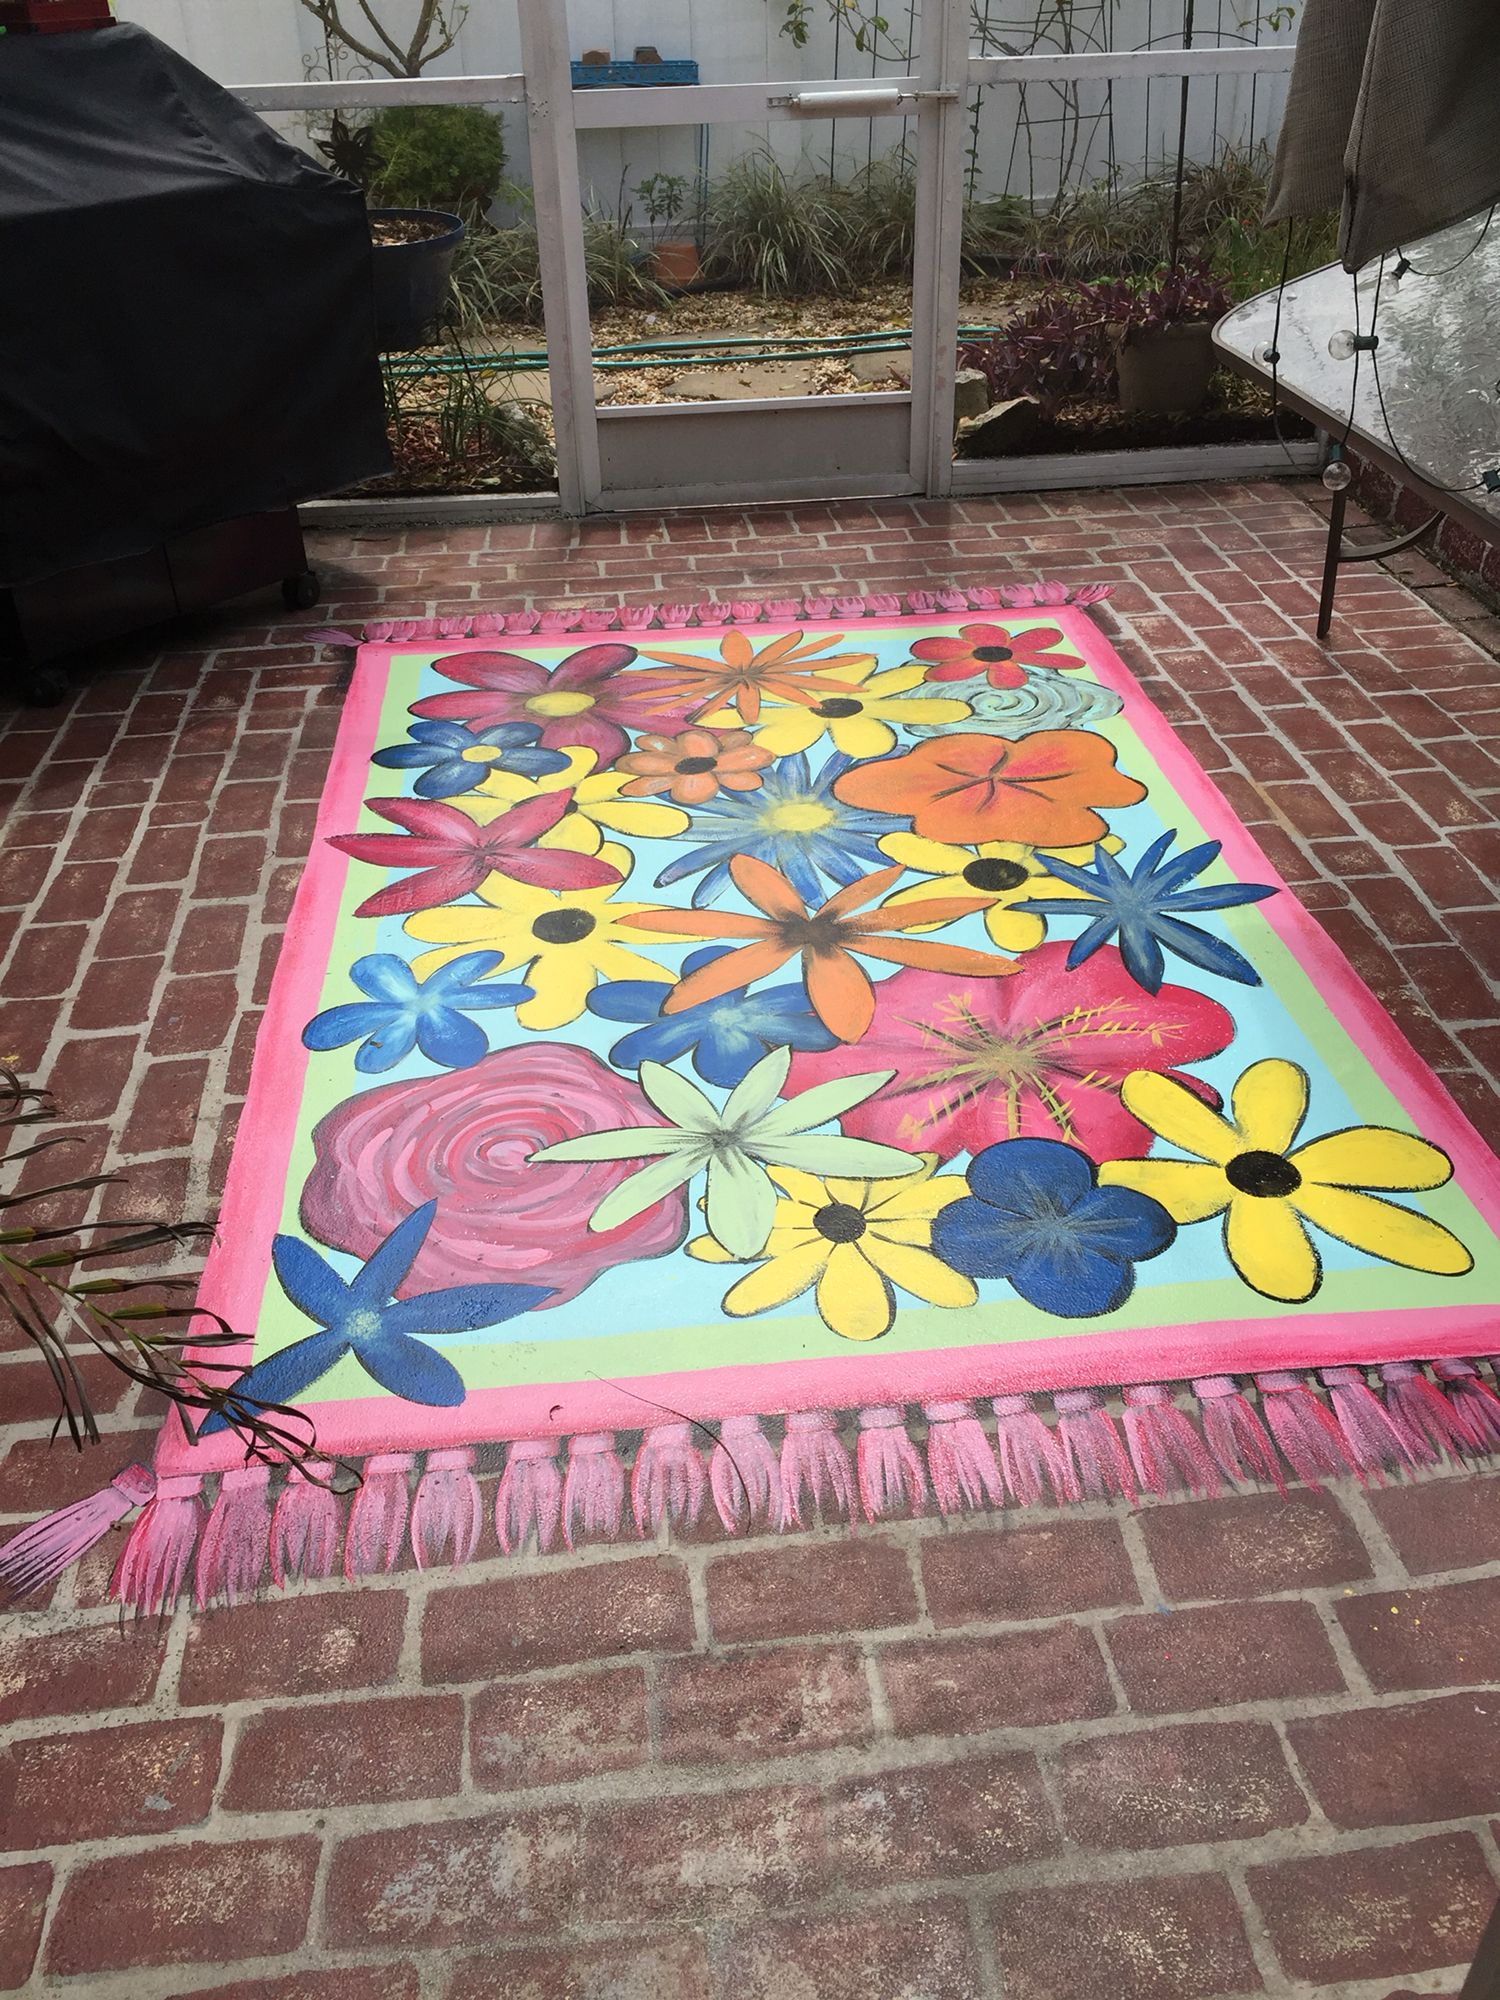 Painted rug on concrete patio | Decor ideas | Patio ...